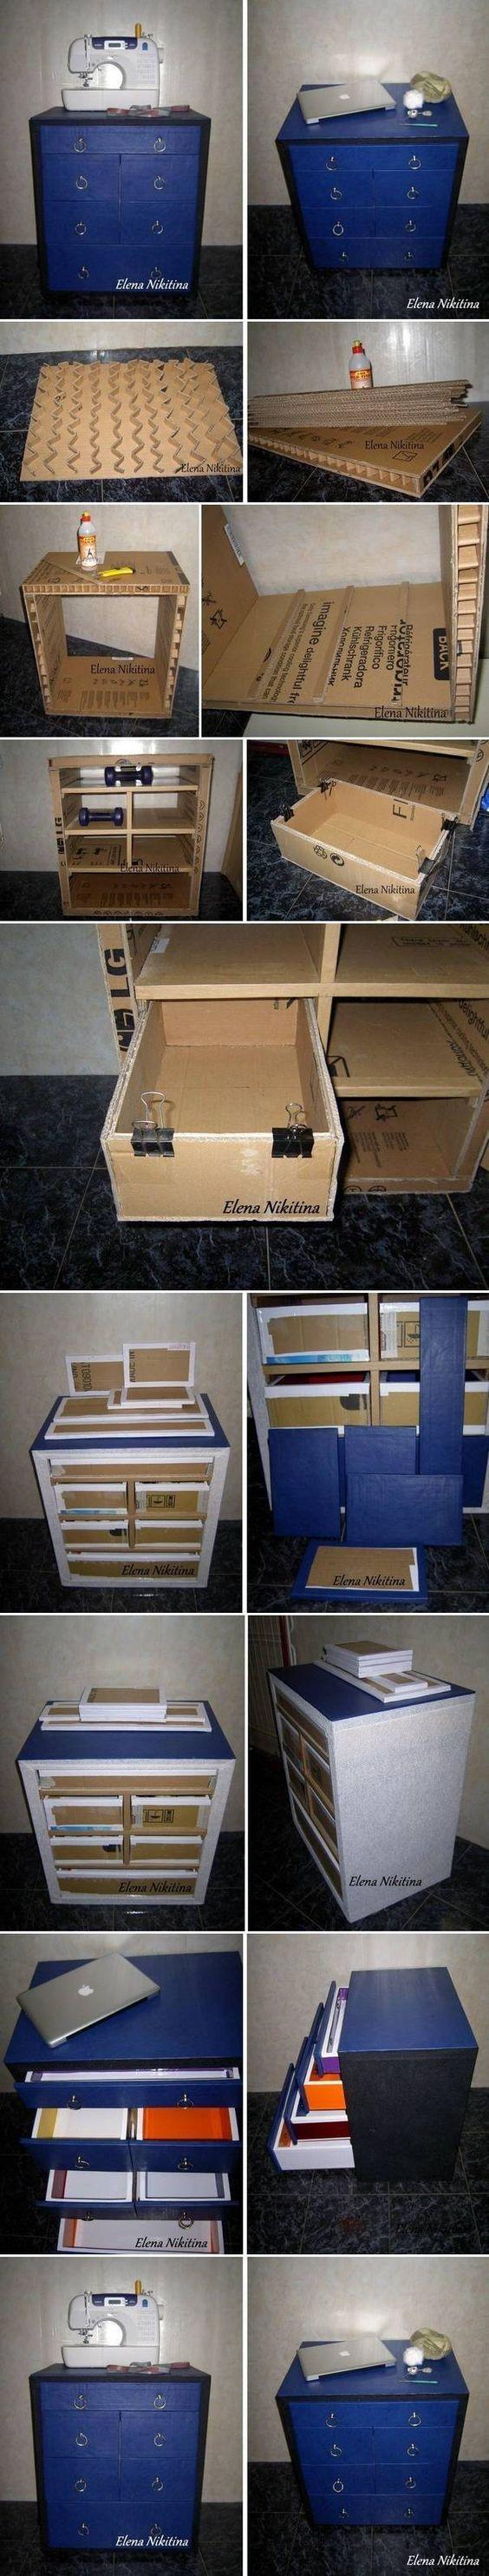 mueble con carton